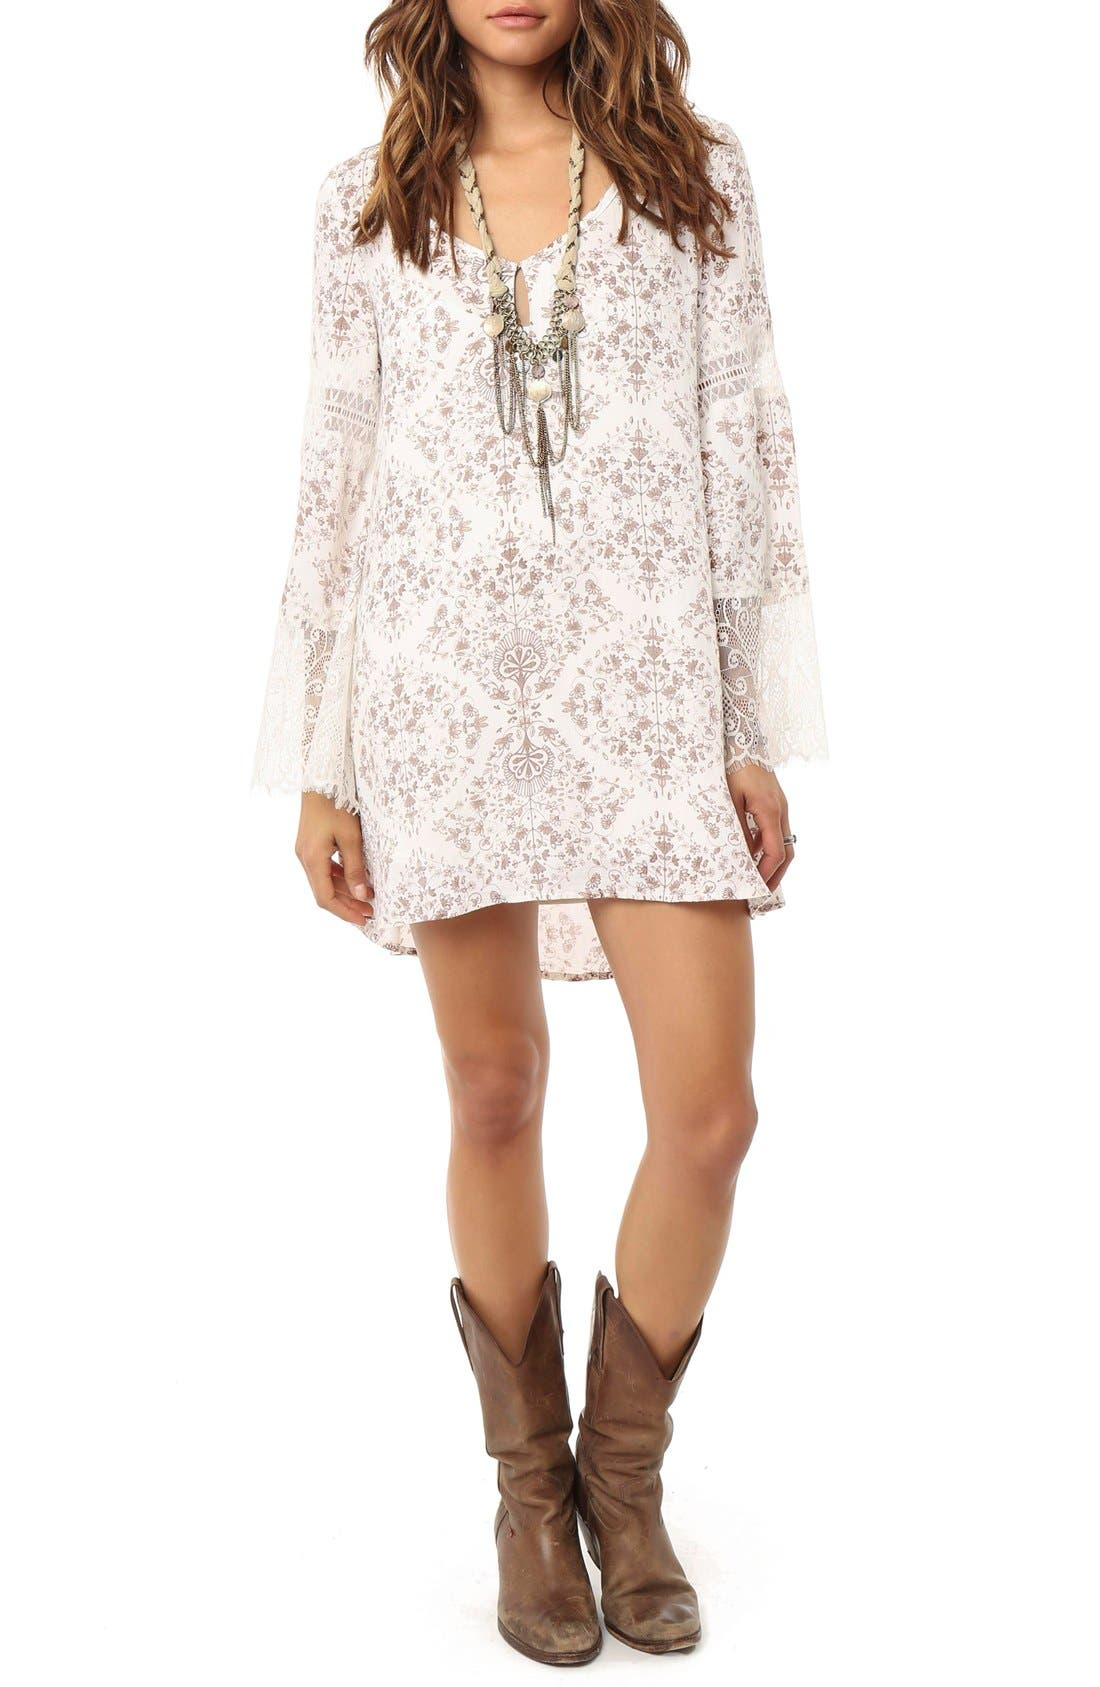 Alternate Image 1 Selected - O'Neil 'Panama' Shift Dress